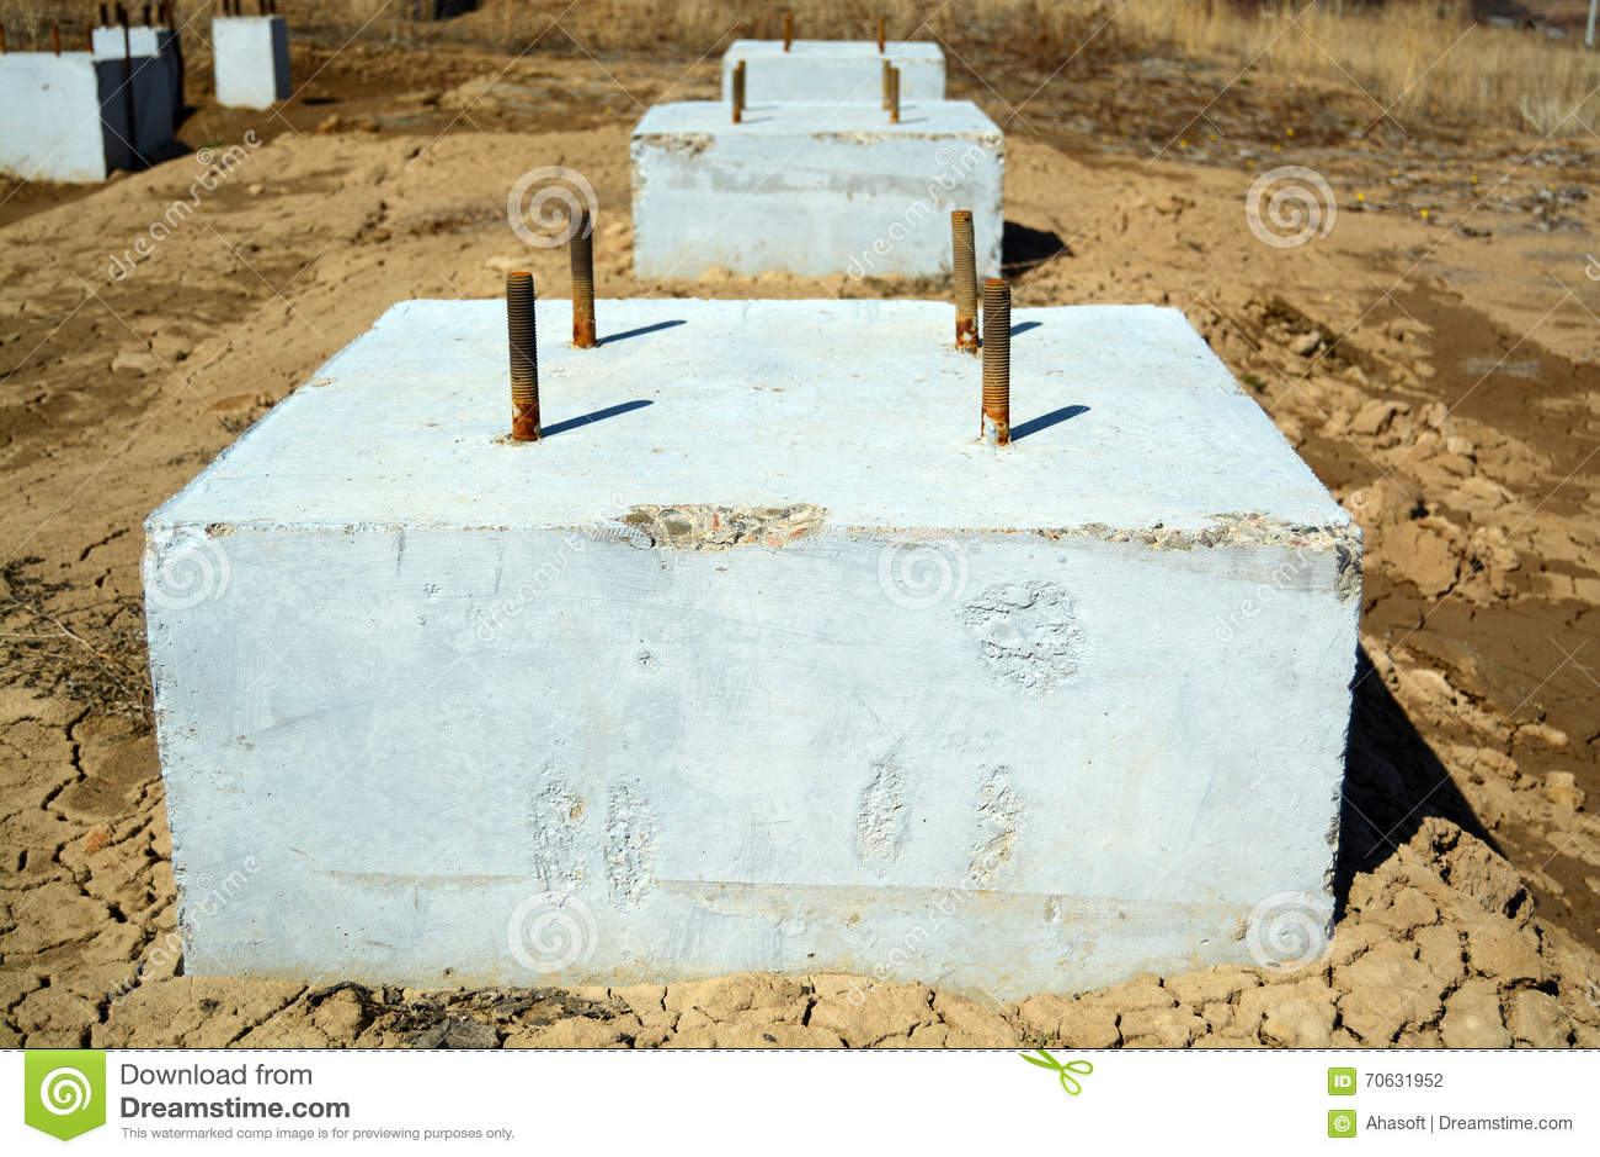 Concrete foundation blocks photo stock photo image 70631952 for Cinder block vs concrete foundation